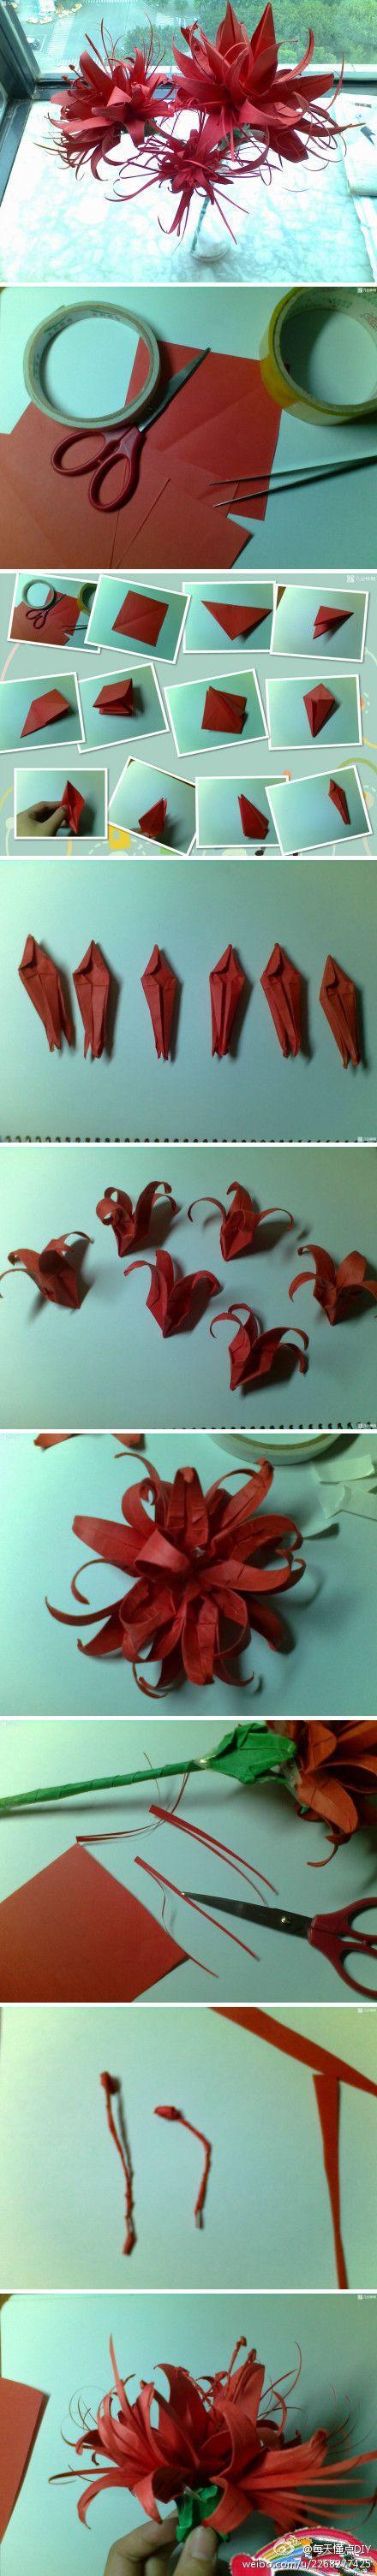 707 best rock paper scissors images on pinterest origami red paper flower diy tutorial craft decor idea cool flor de dhlflorist Images